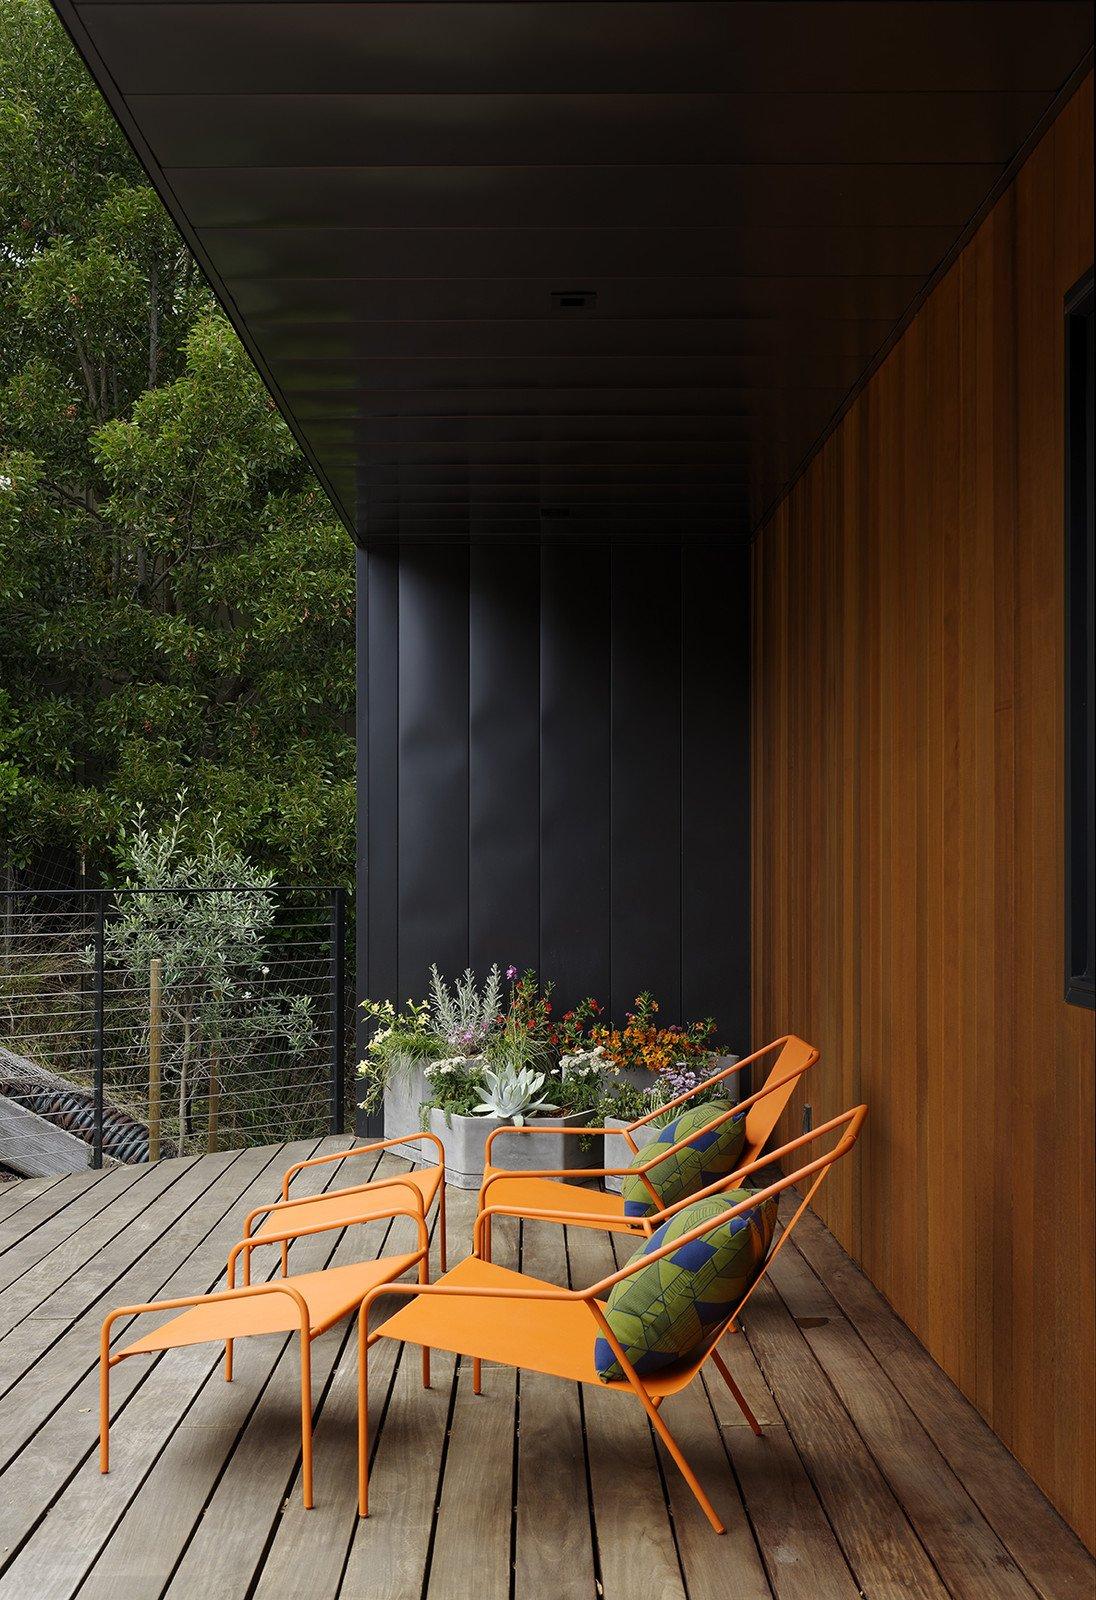 Dwell Modern Lounge Furniture. Modern By Dwell Magazine Posture Chair And  Ottoman Set Lounge Furniture